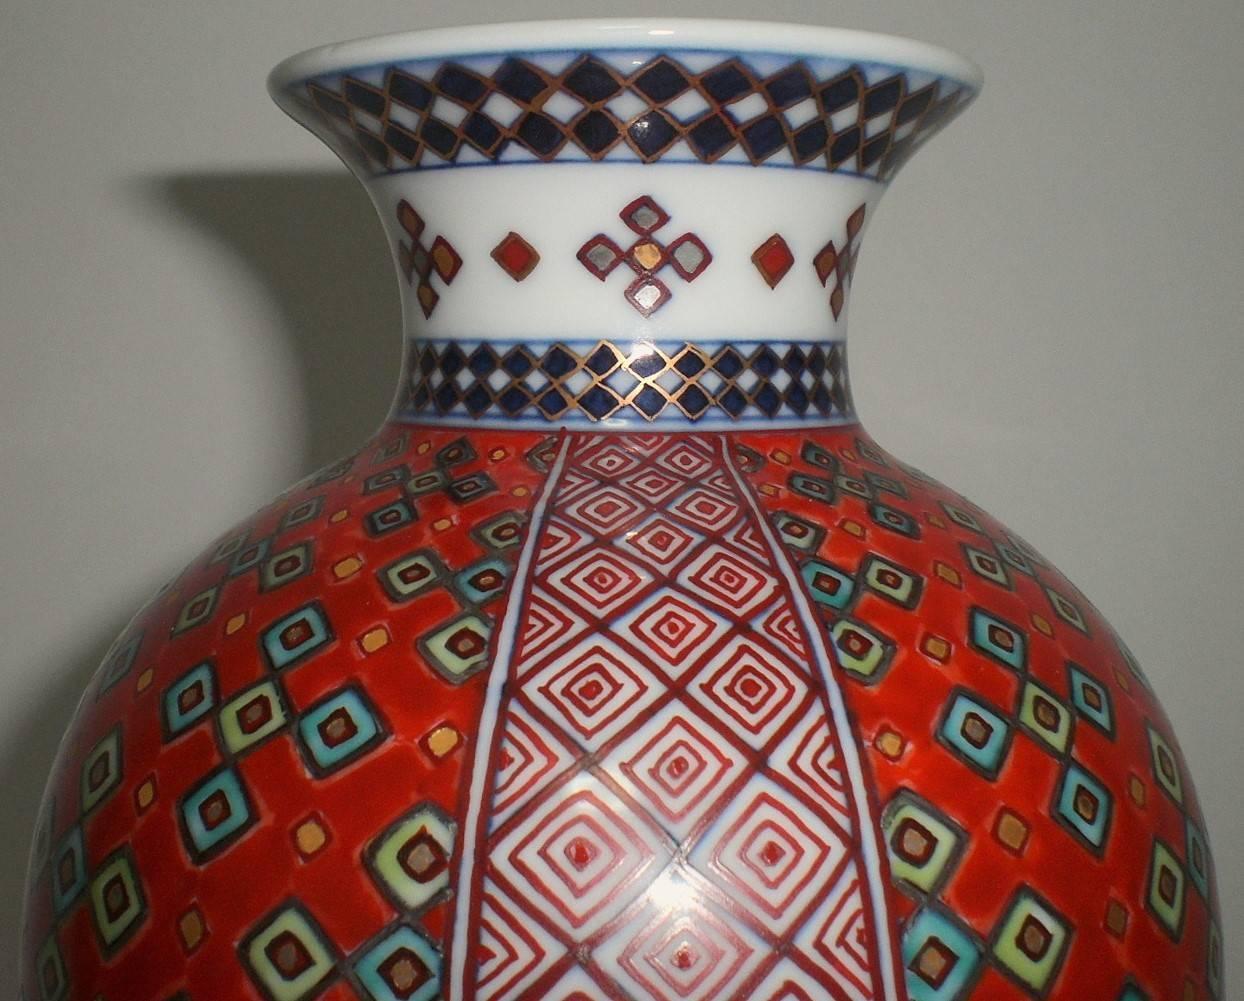 12 Great White Ceramic Geometric Vase 2021 free download white ceramic geometric vase of contemporary decorative porcelain vase by japanese master porcelain within contemporary decorative porcelain vase by japanese master porcelain artist for sale